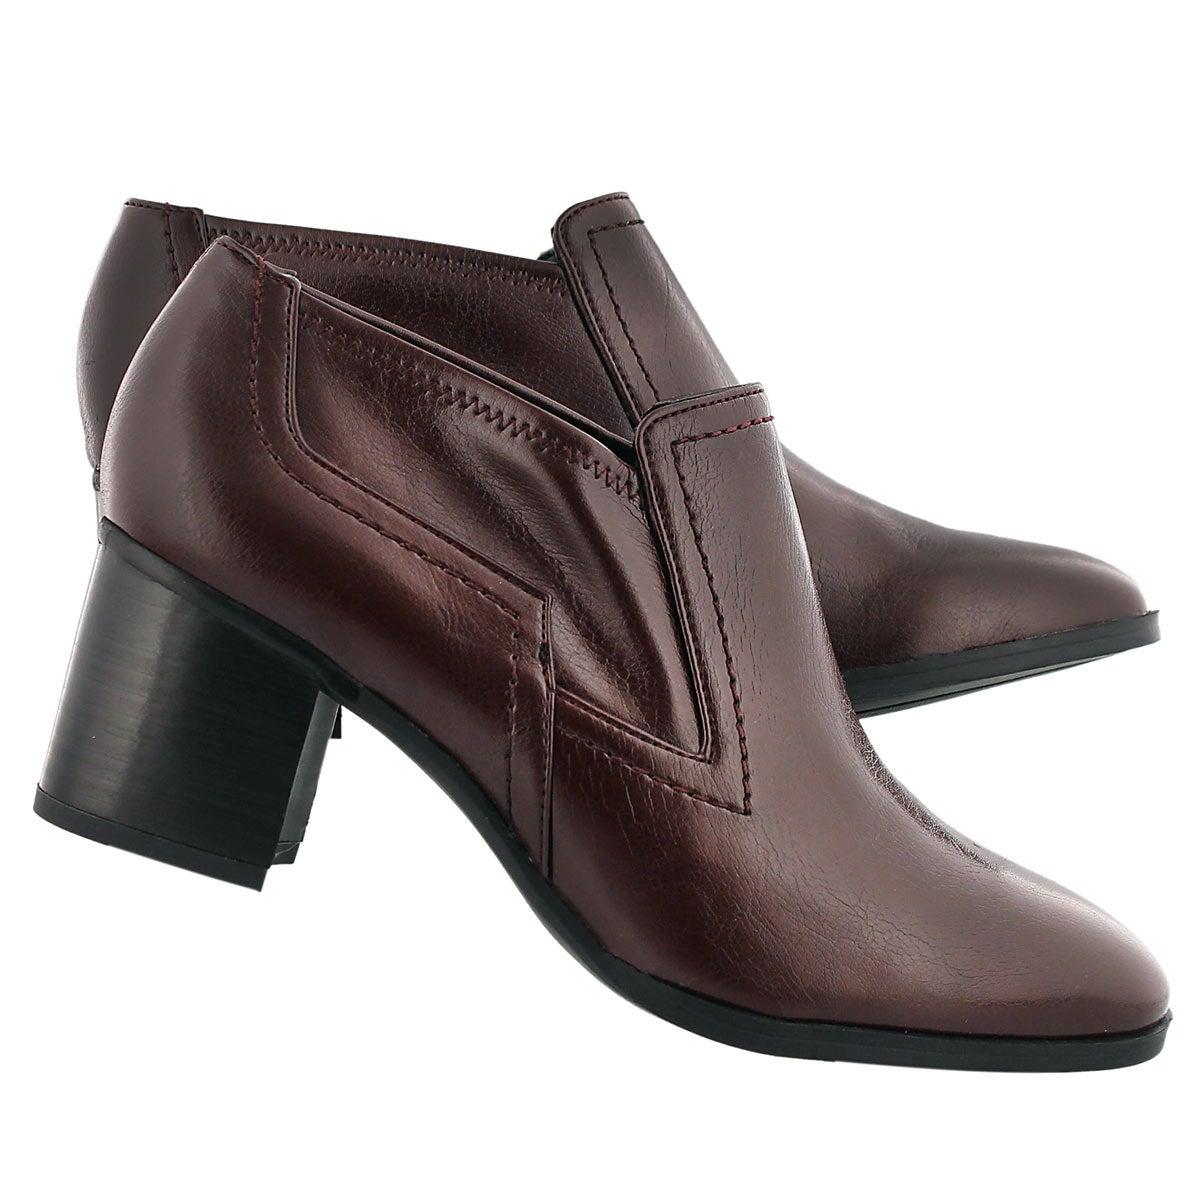 Lds Ashland vino slip on dress shoe